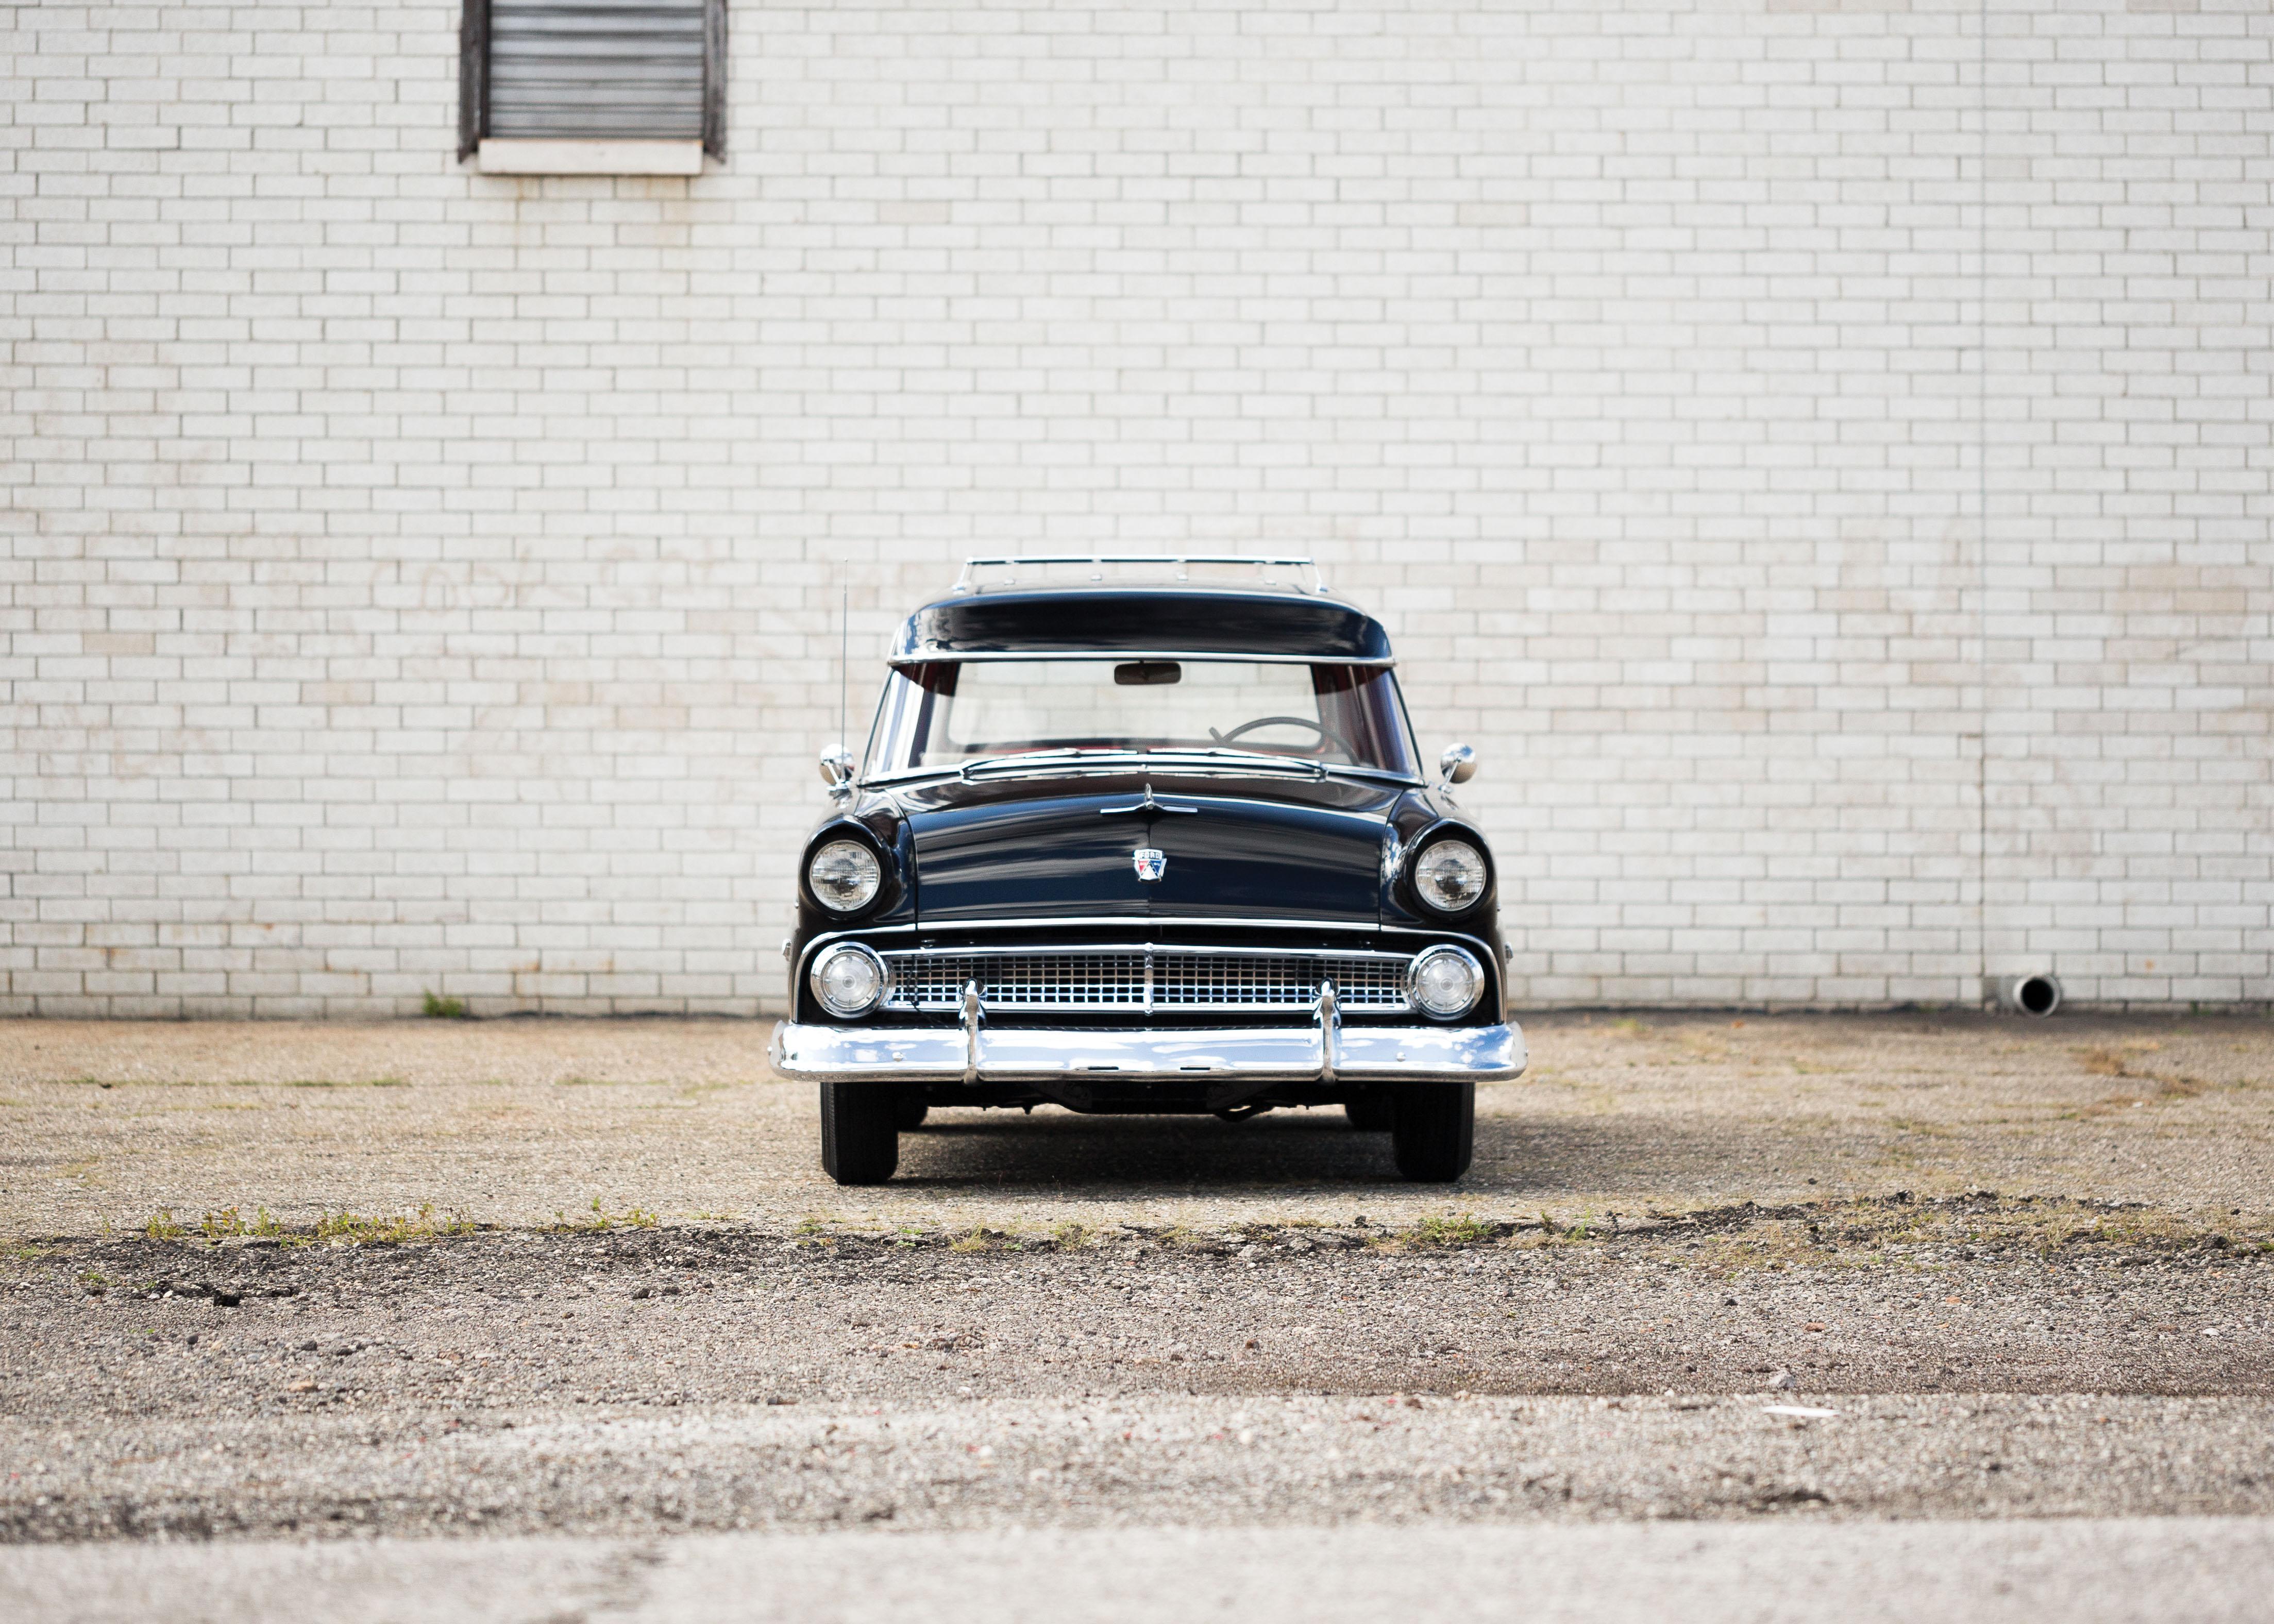 1955 Ford Country Sedan Wagon_Credit Drew Shipley © 2015 Auctions America